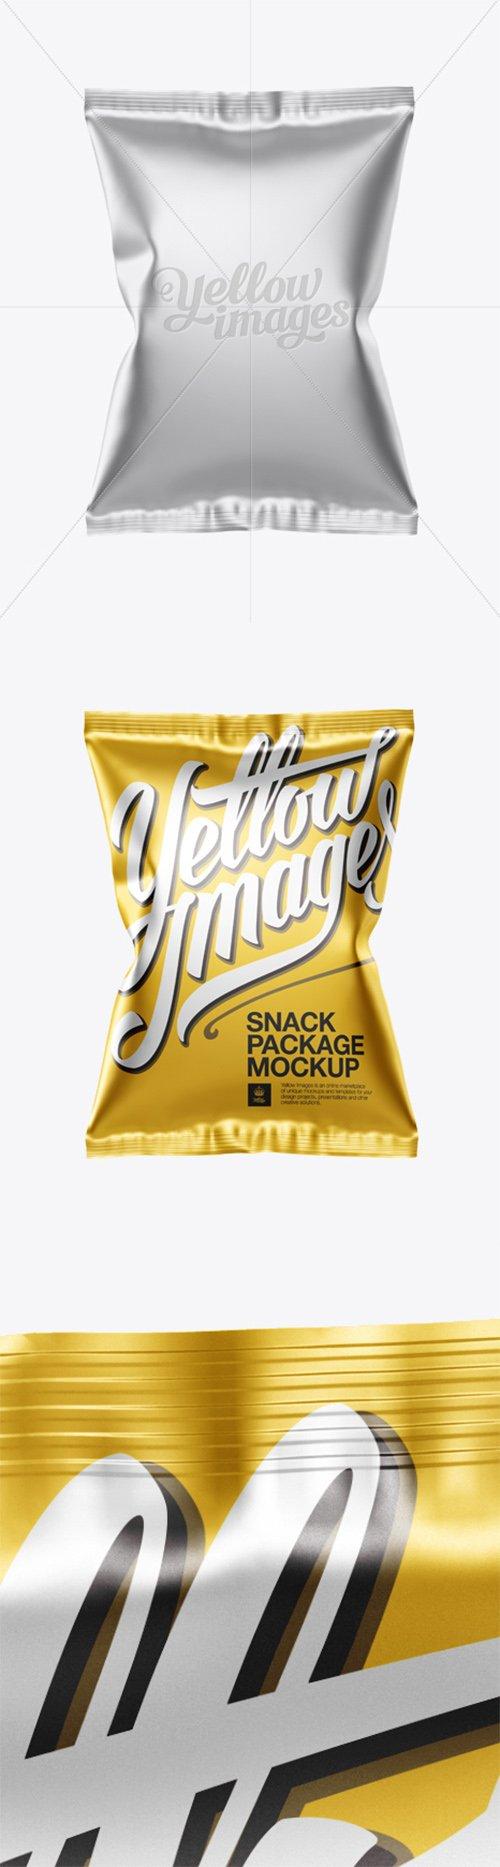 Matte Metallic Snack Package Mockup - Front View 12709 TIF